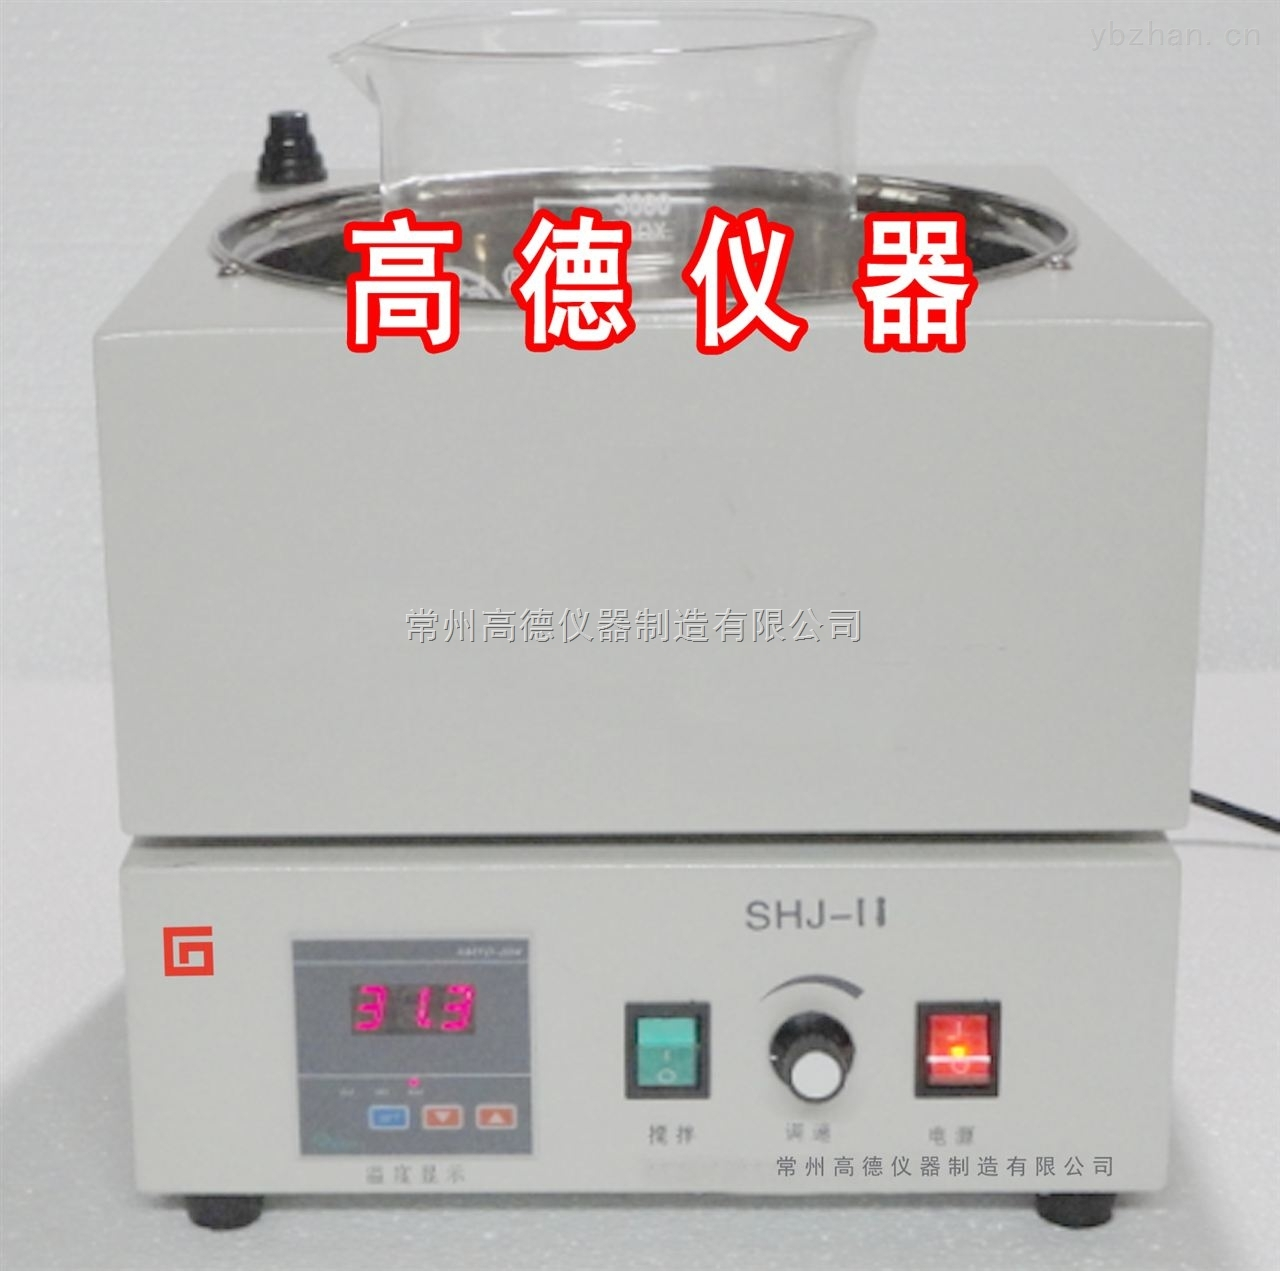 SHJ-II-水浴磁力攪拌器